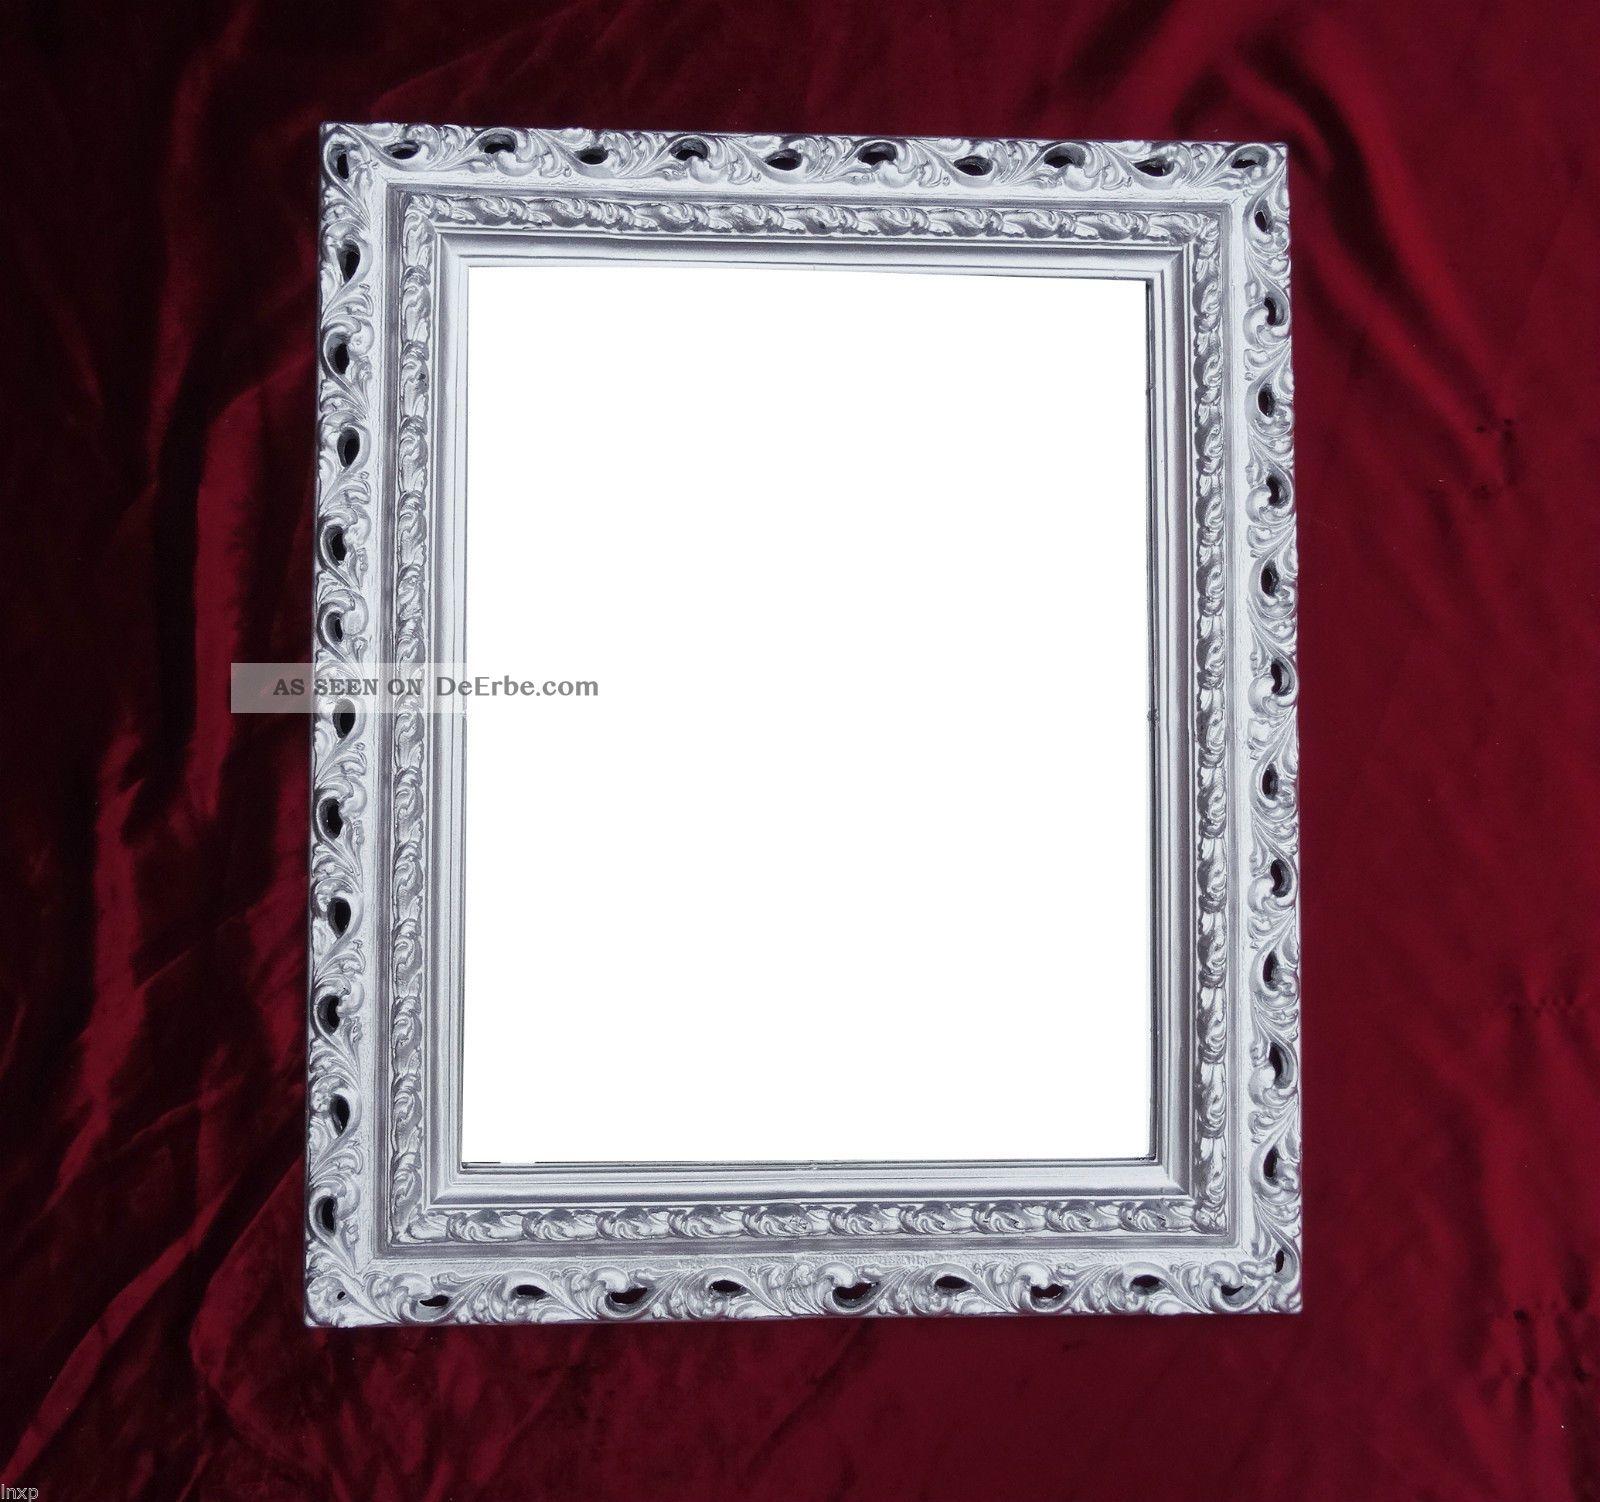 wandspiegel 43x36 spiegel barock rechteckig repro silber bilderrahmen arabesco 3. Black Bedroom Furniture Sets. Home Design Ideas